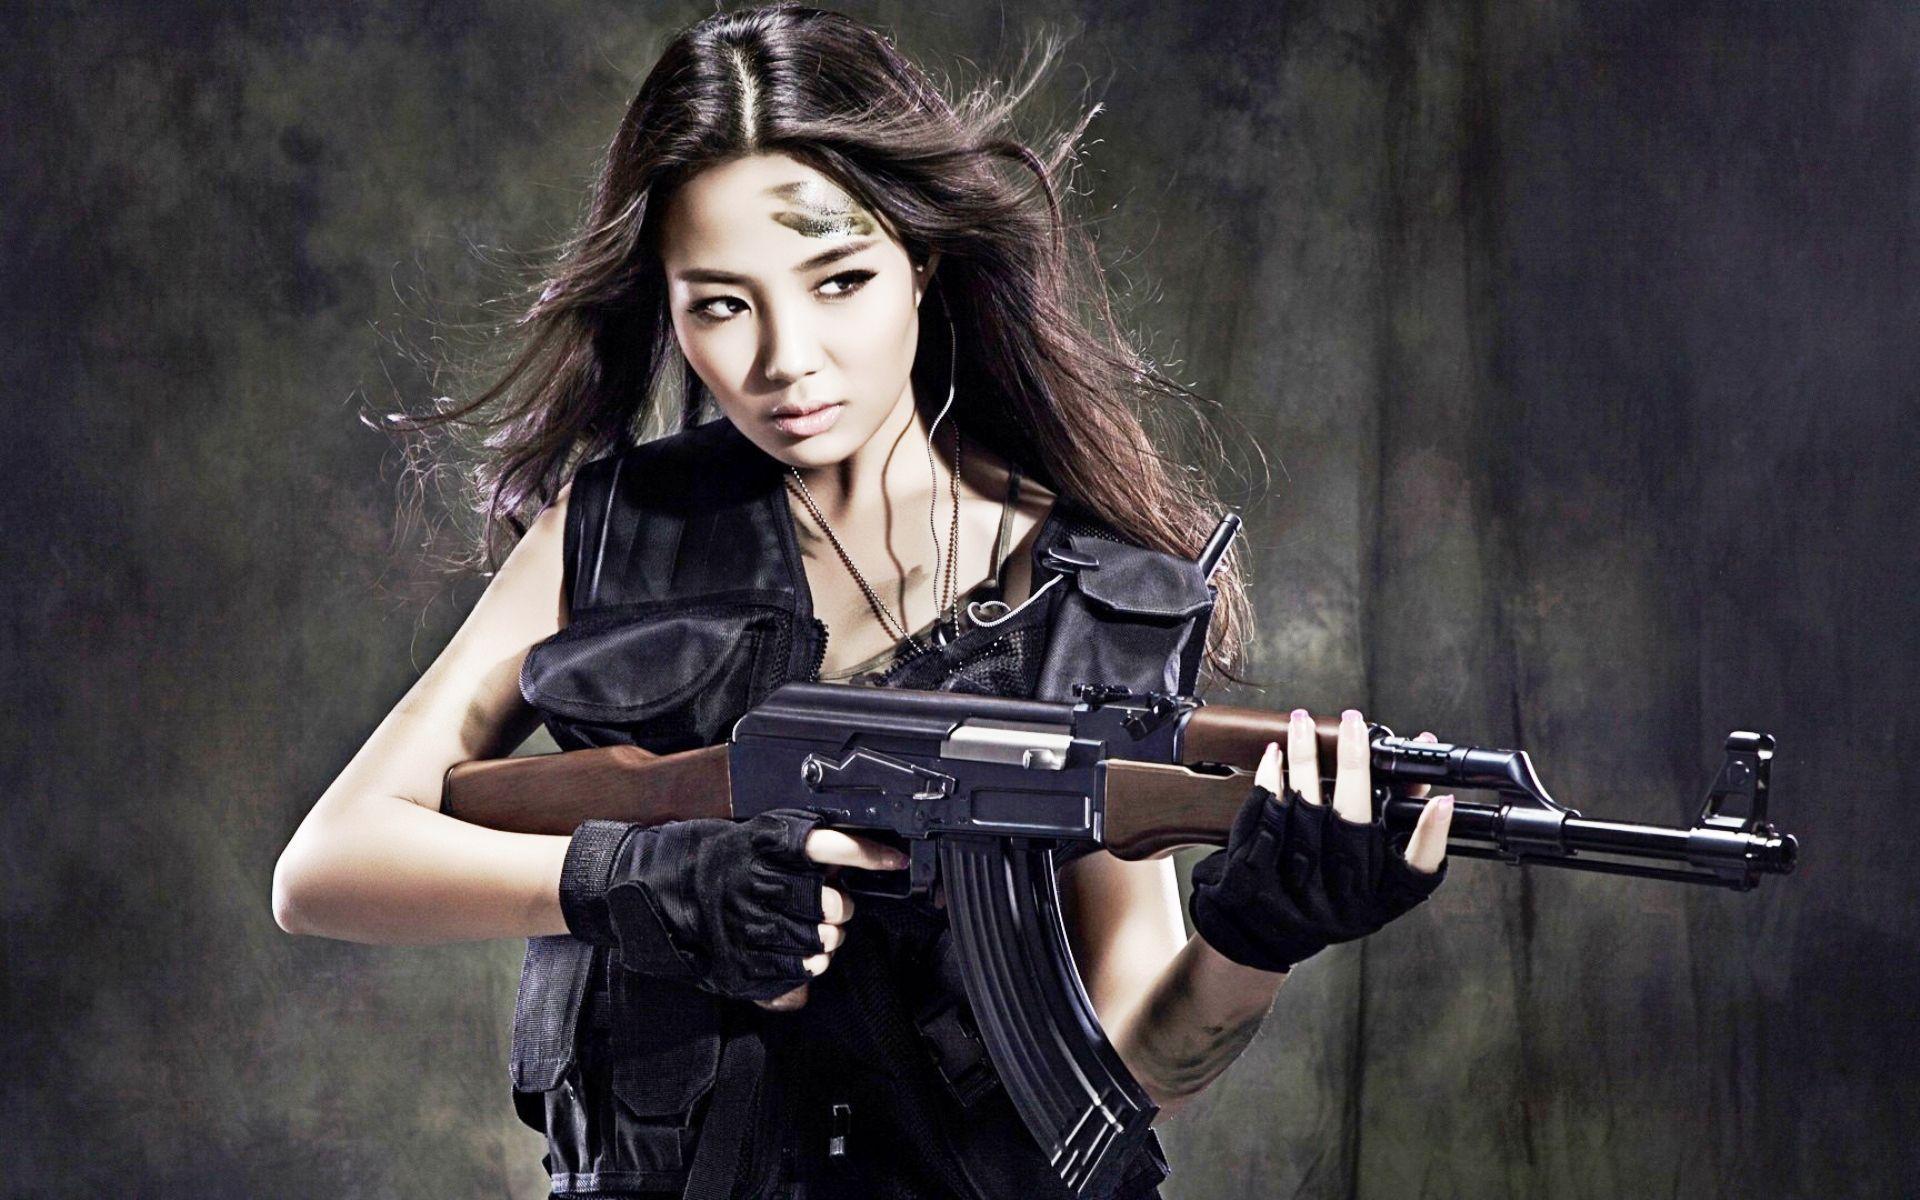 Best pics of shooter girls